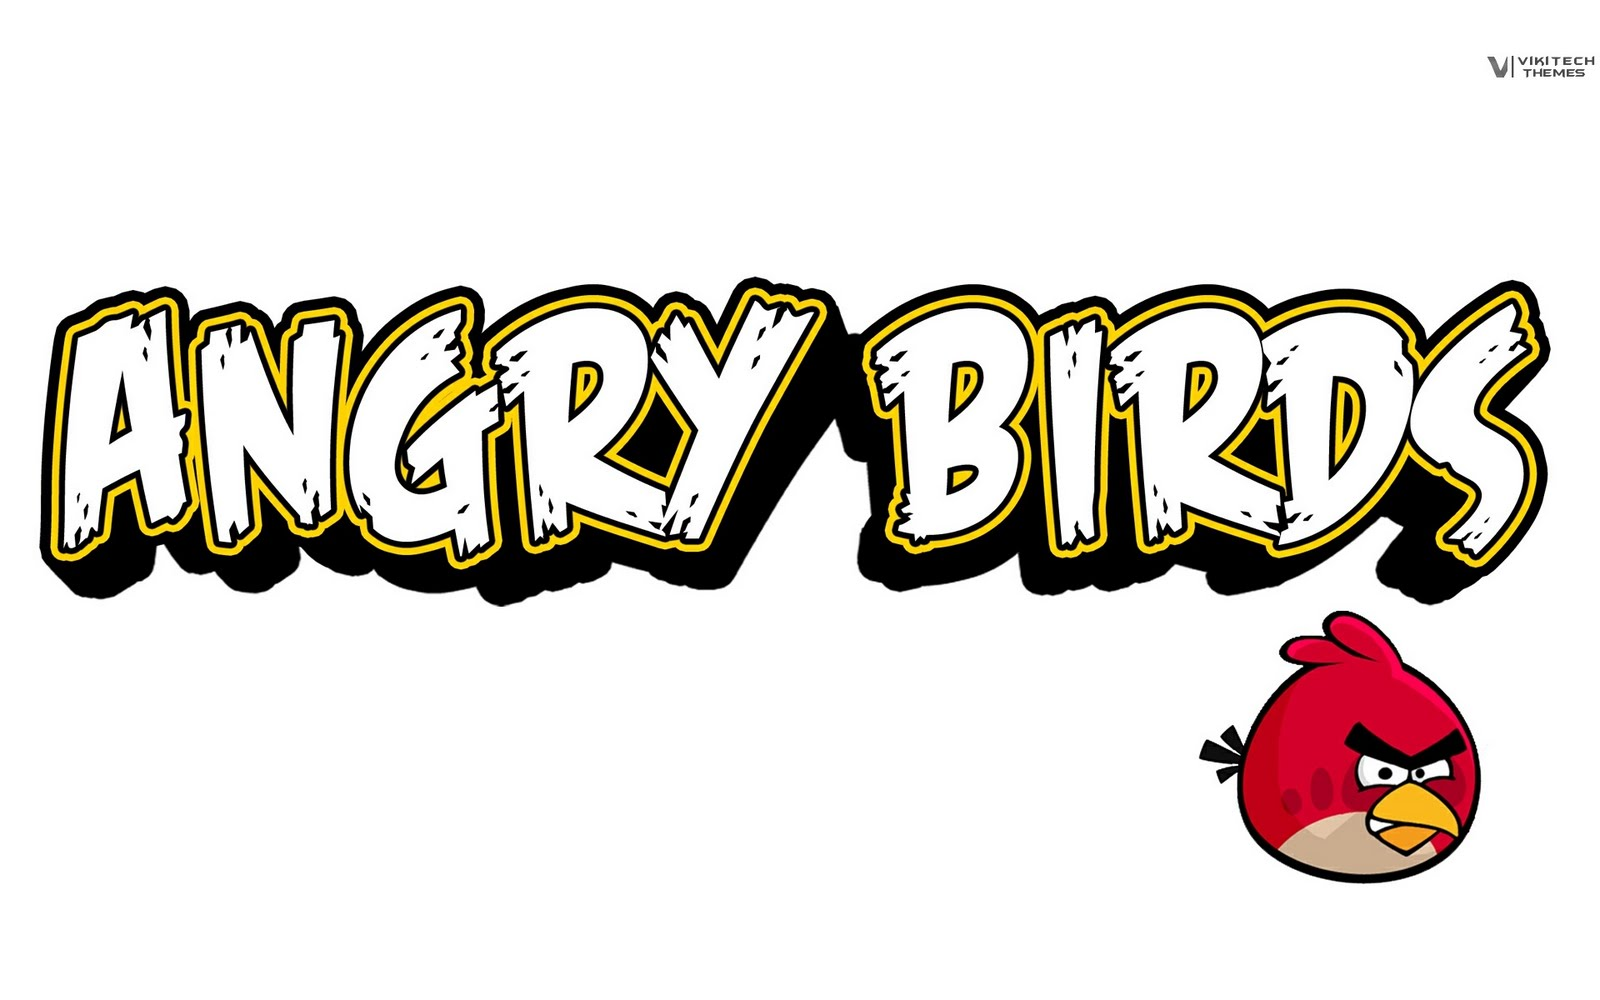 Angrybirds Francescanatale 05: WallpapersKu: Angry Birds Wallpapers